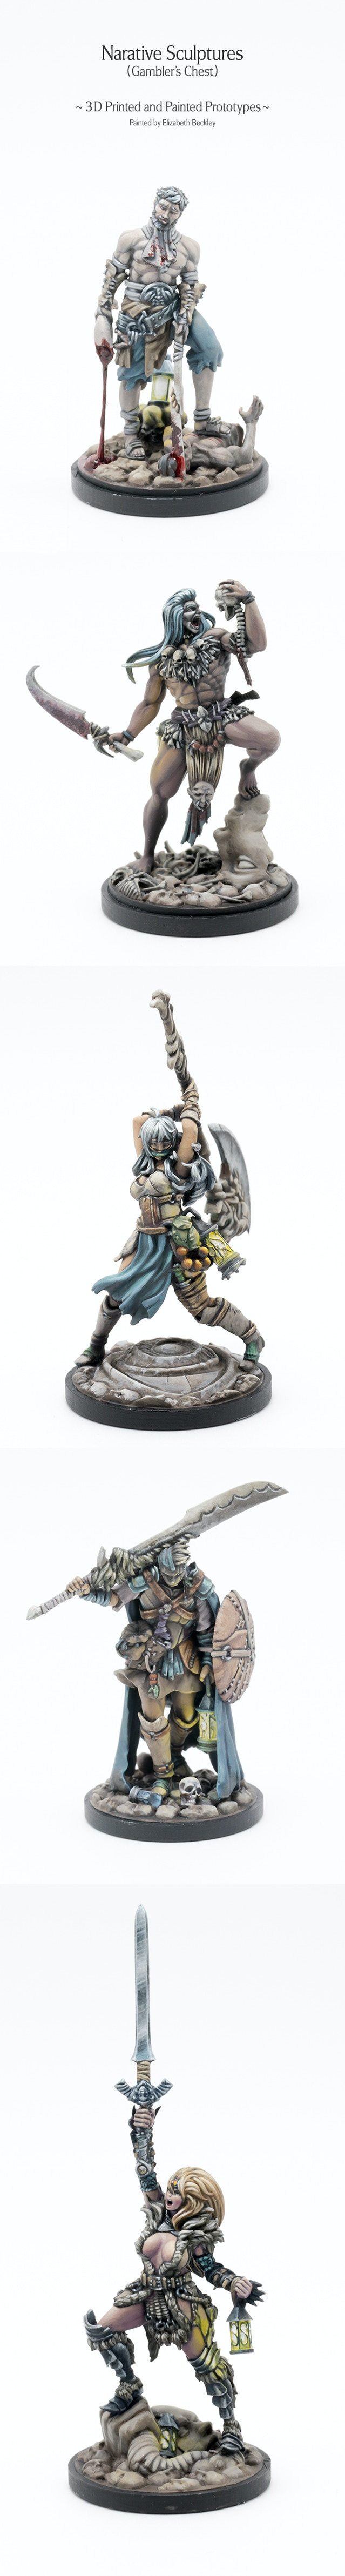 Kingdom Death Monster By Kingdom Death Kickstarter - 15 brilliantly decorated casts well worth broken bones